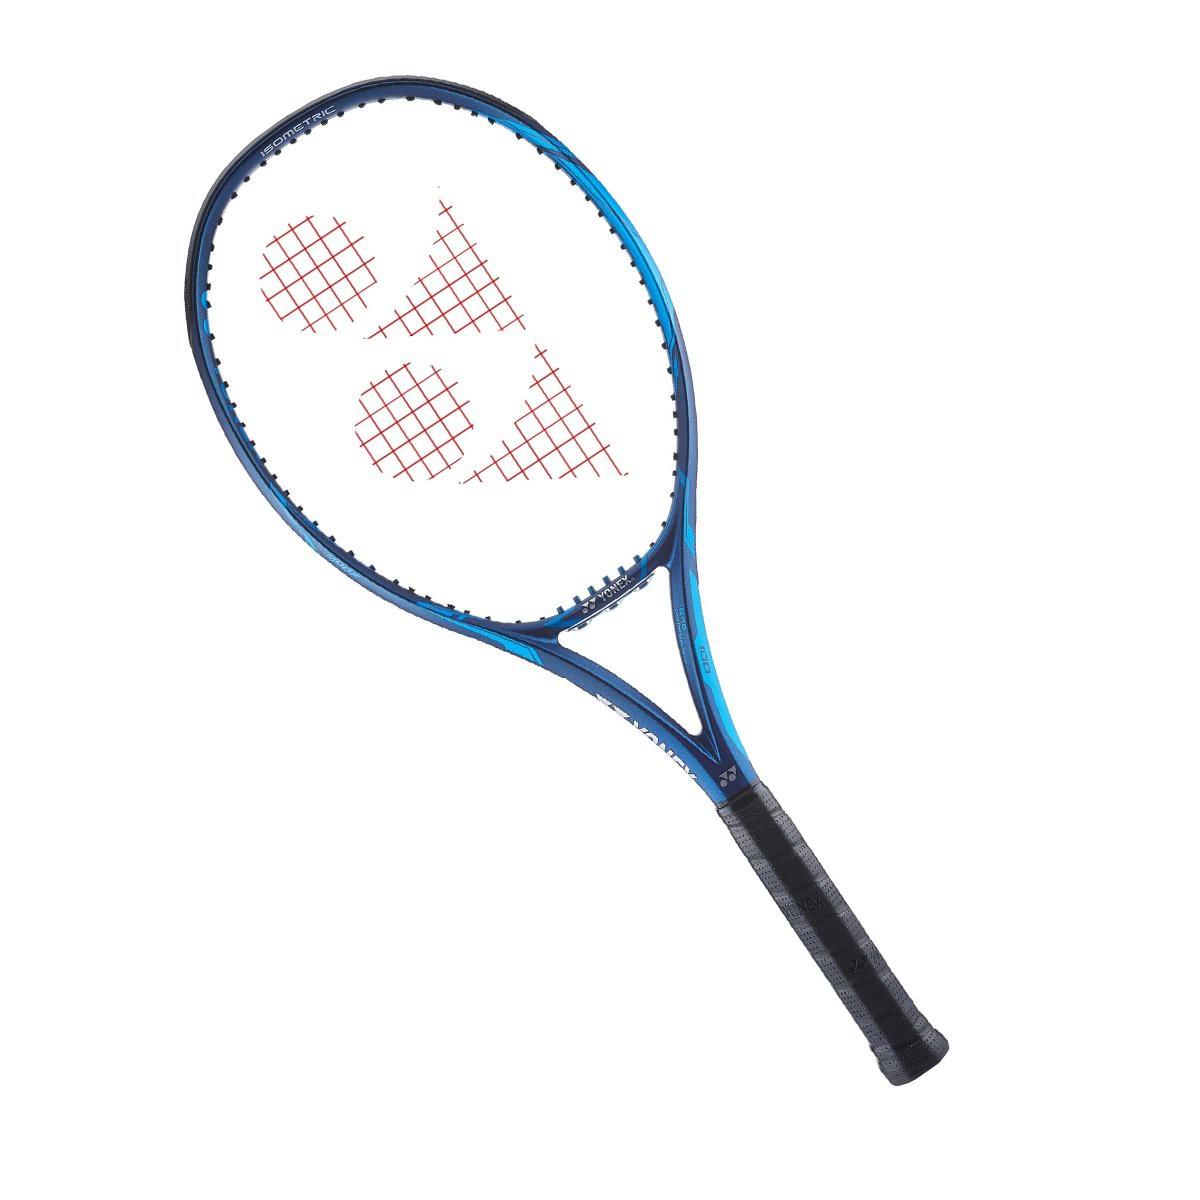 Raquete de Tênis Yonex Ezone 100 2020 Azul 300g